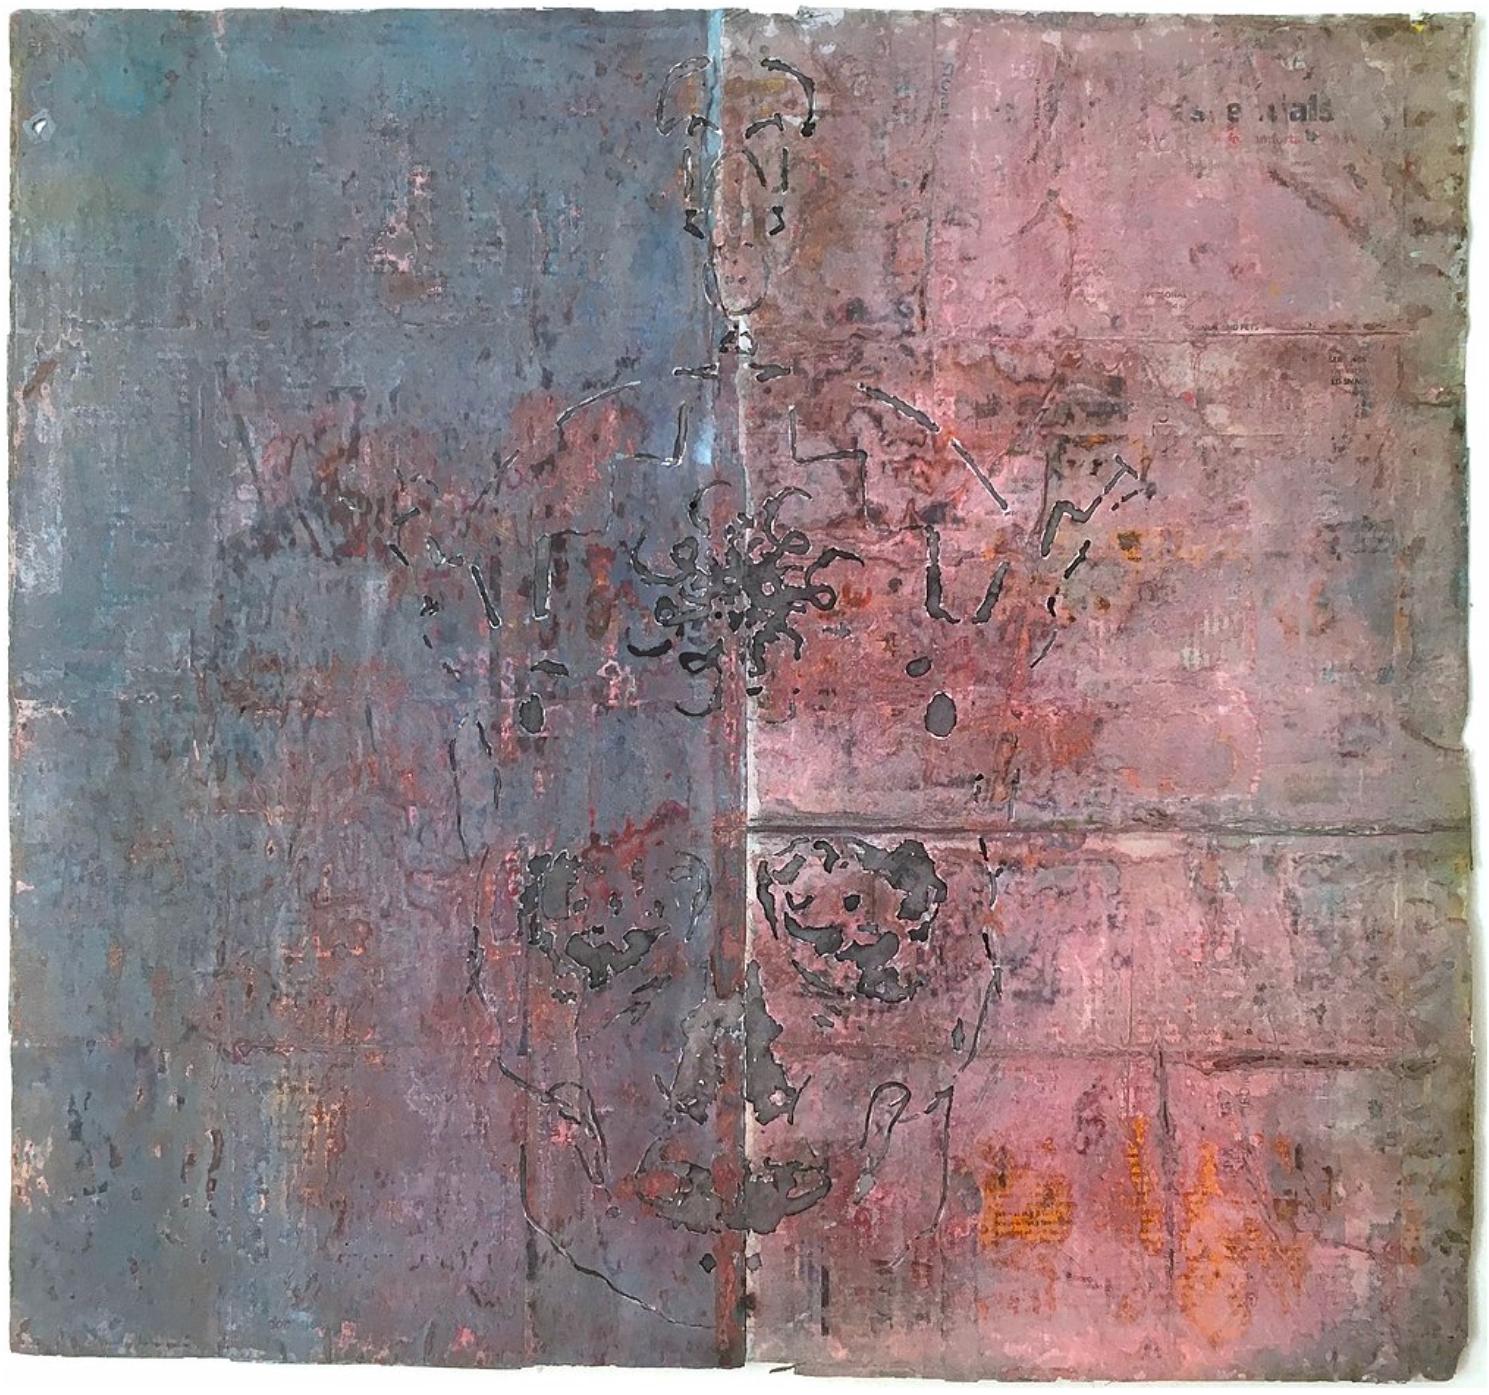 Farzad Kohan, King is Dead, mixed media on paper,56 x 52 cm, 2015